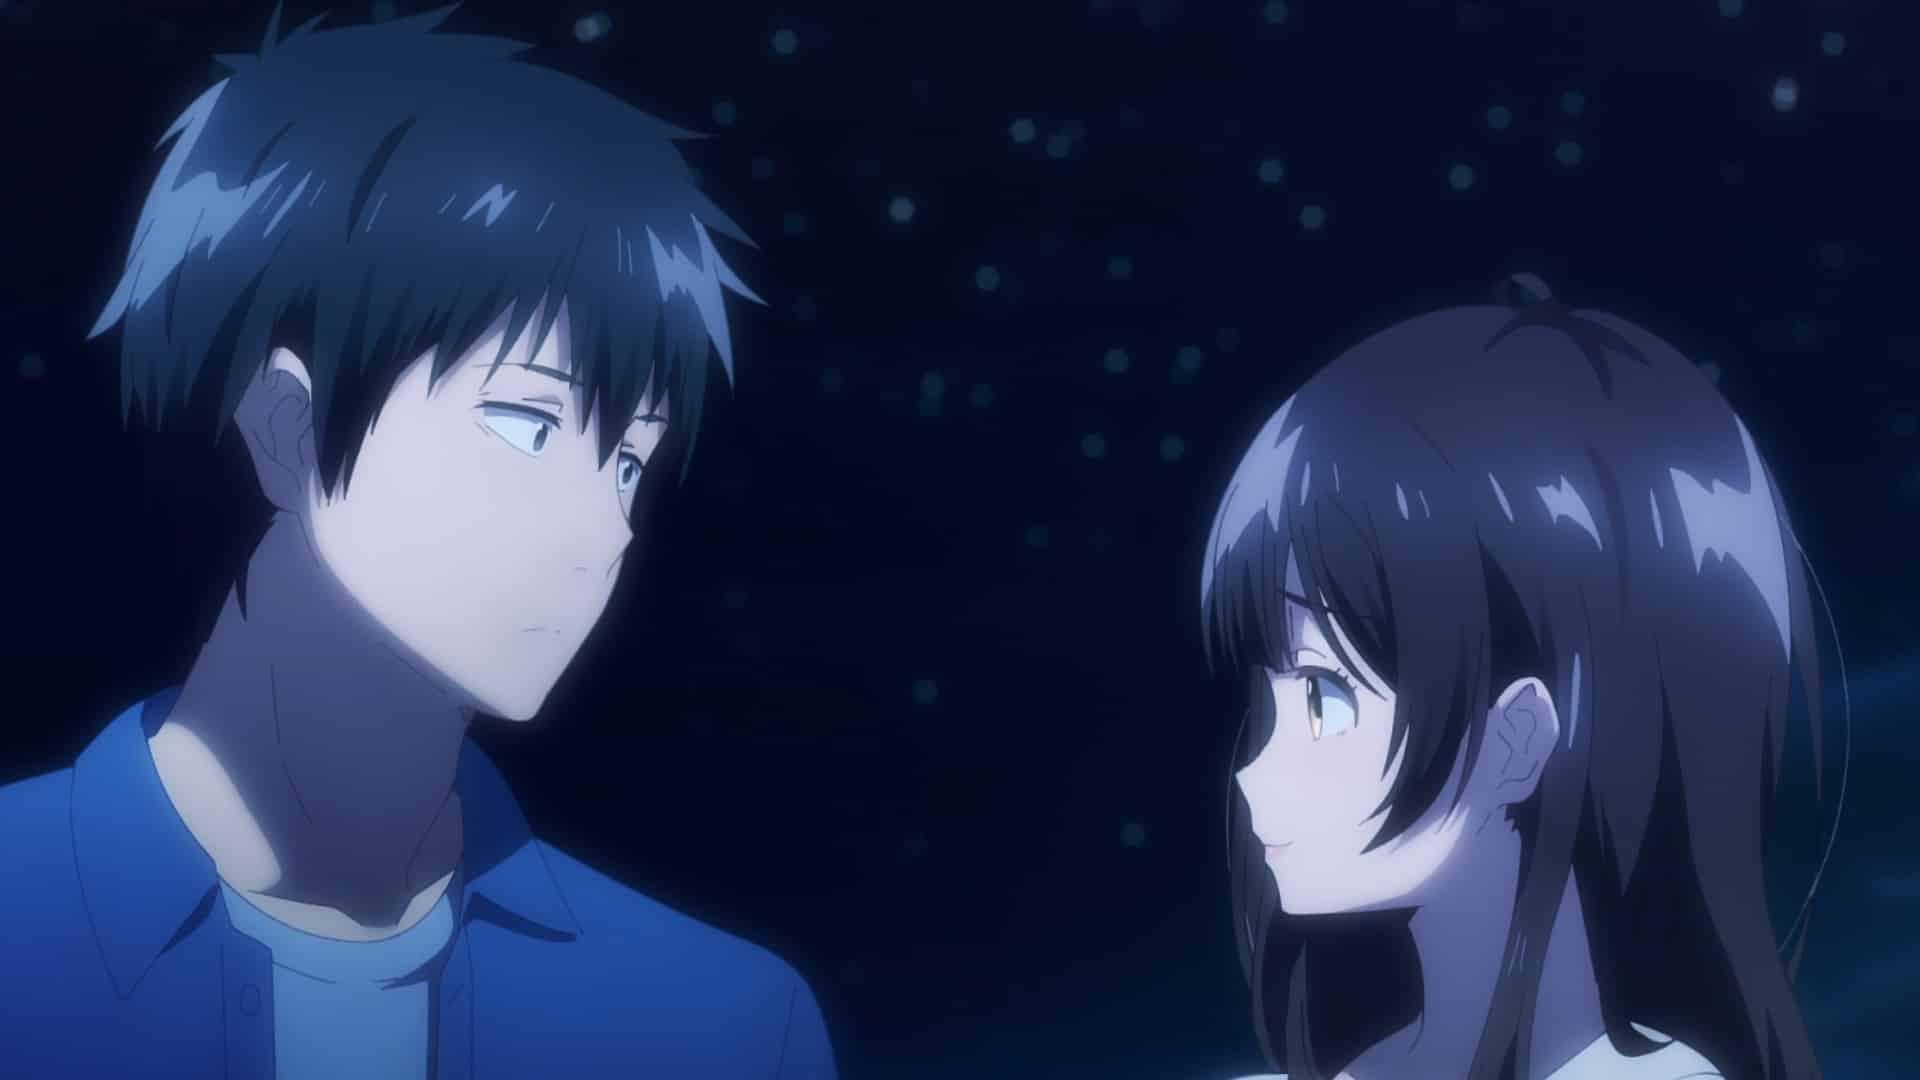 Yoshida and Sayu looking at one another